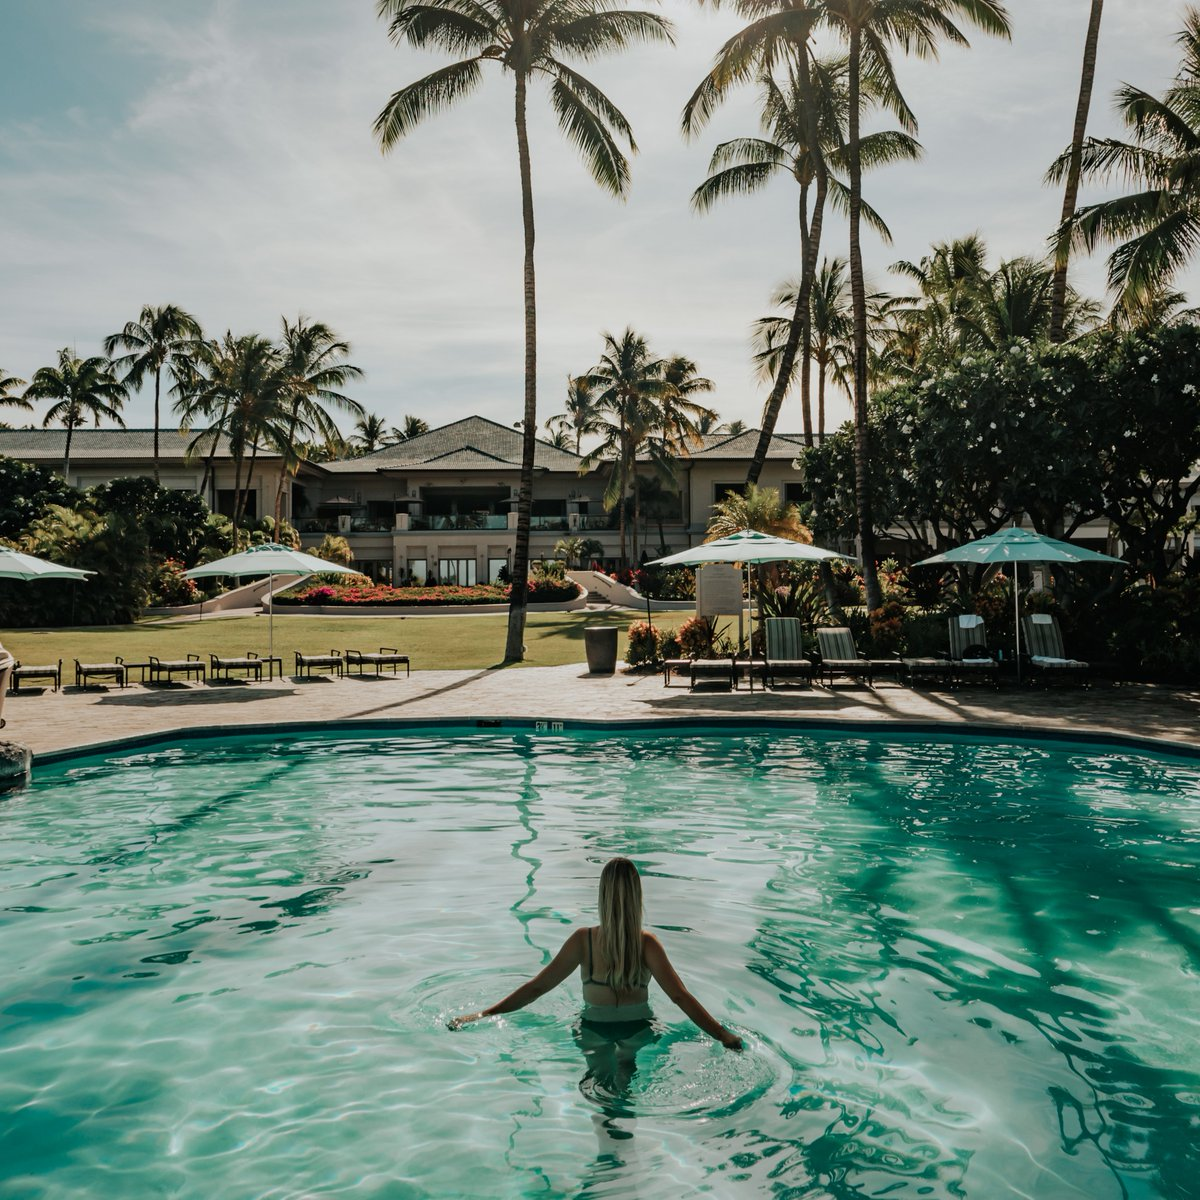 Bask in that summer glow. #MondayBlues 📸: @anda1000words  #FairmontOrchid #Hawaii #OnlyAtTheOrchid #HawaiiIsland #Fairmont #FairmontHotels #PoolSide #Summer #Paradise https://t.co/p0daQ8xiiI